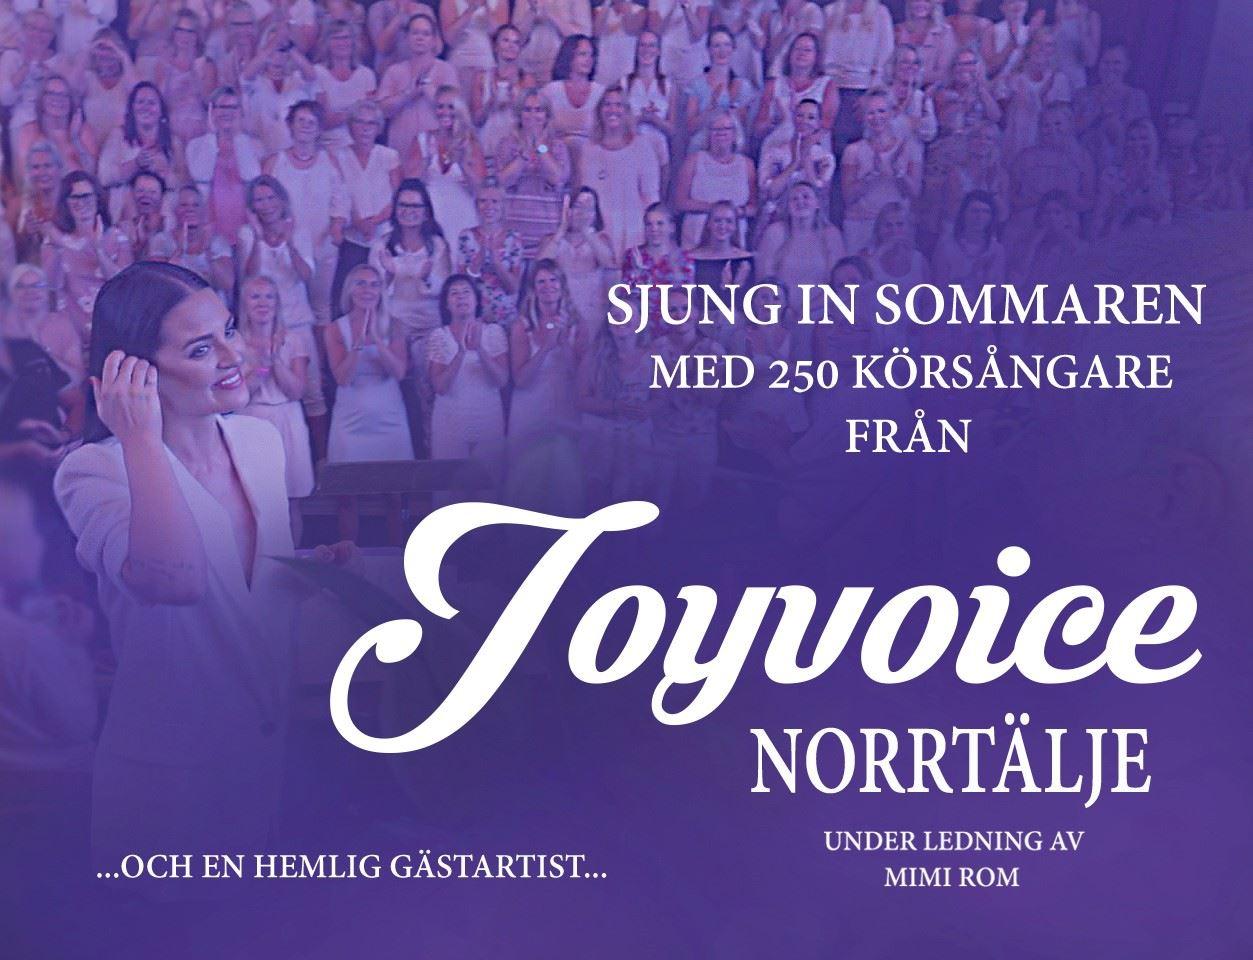 Sommarkonsert med Joyvoice Norrtälje